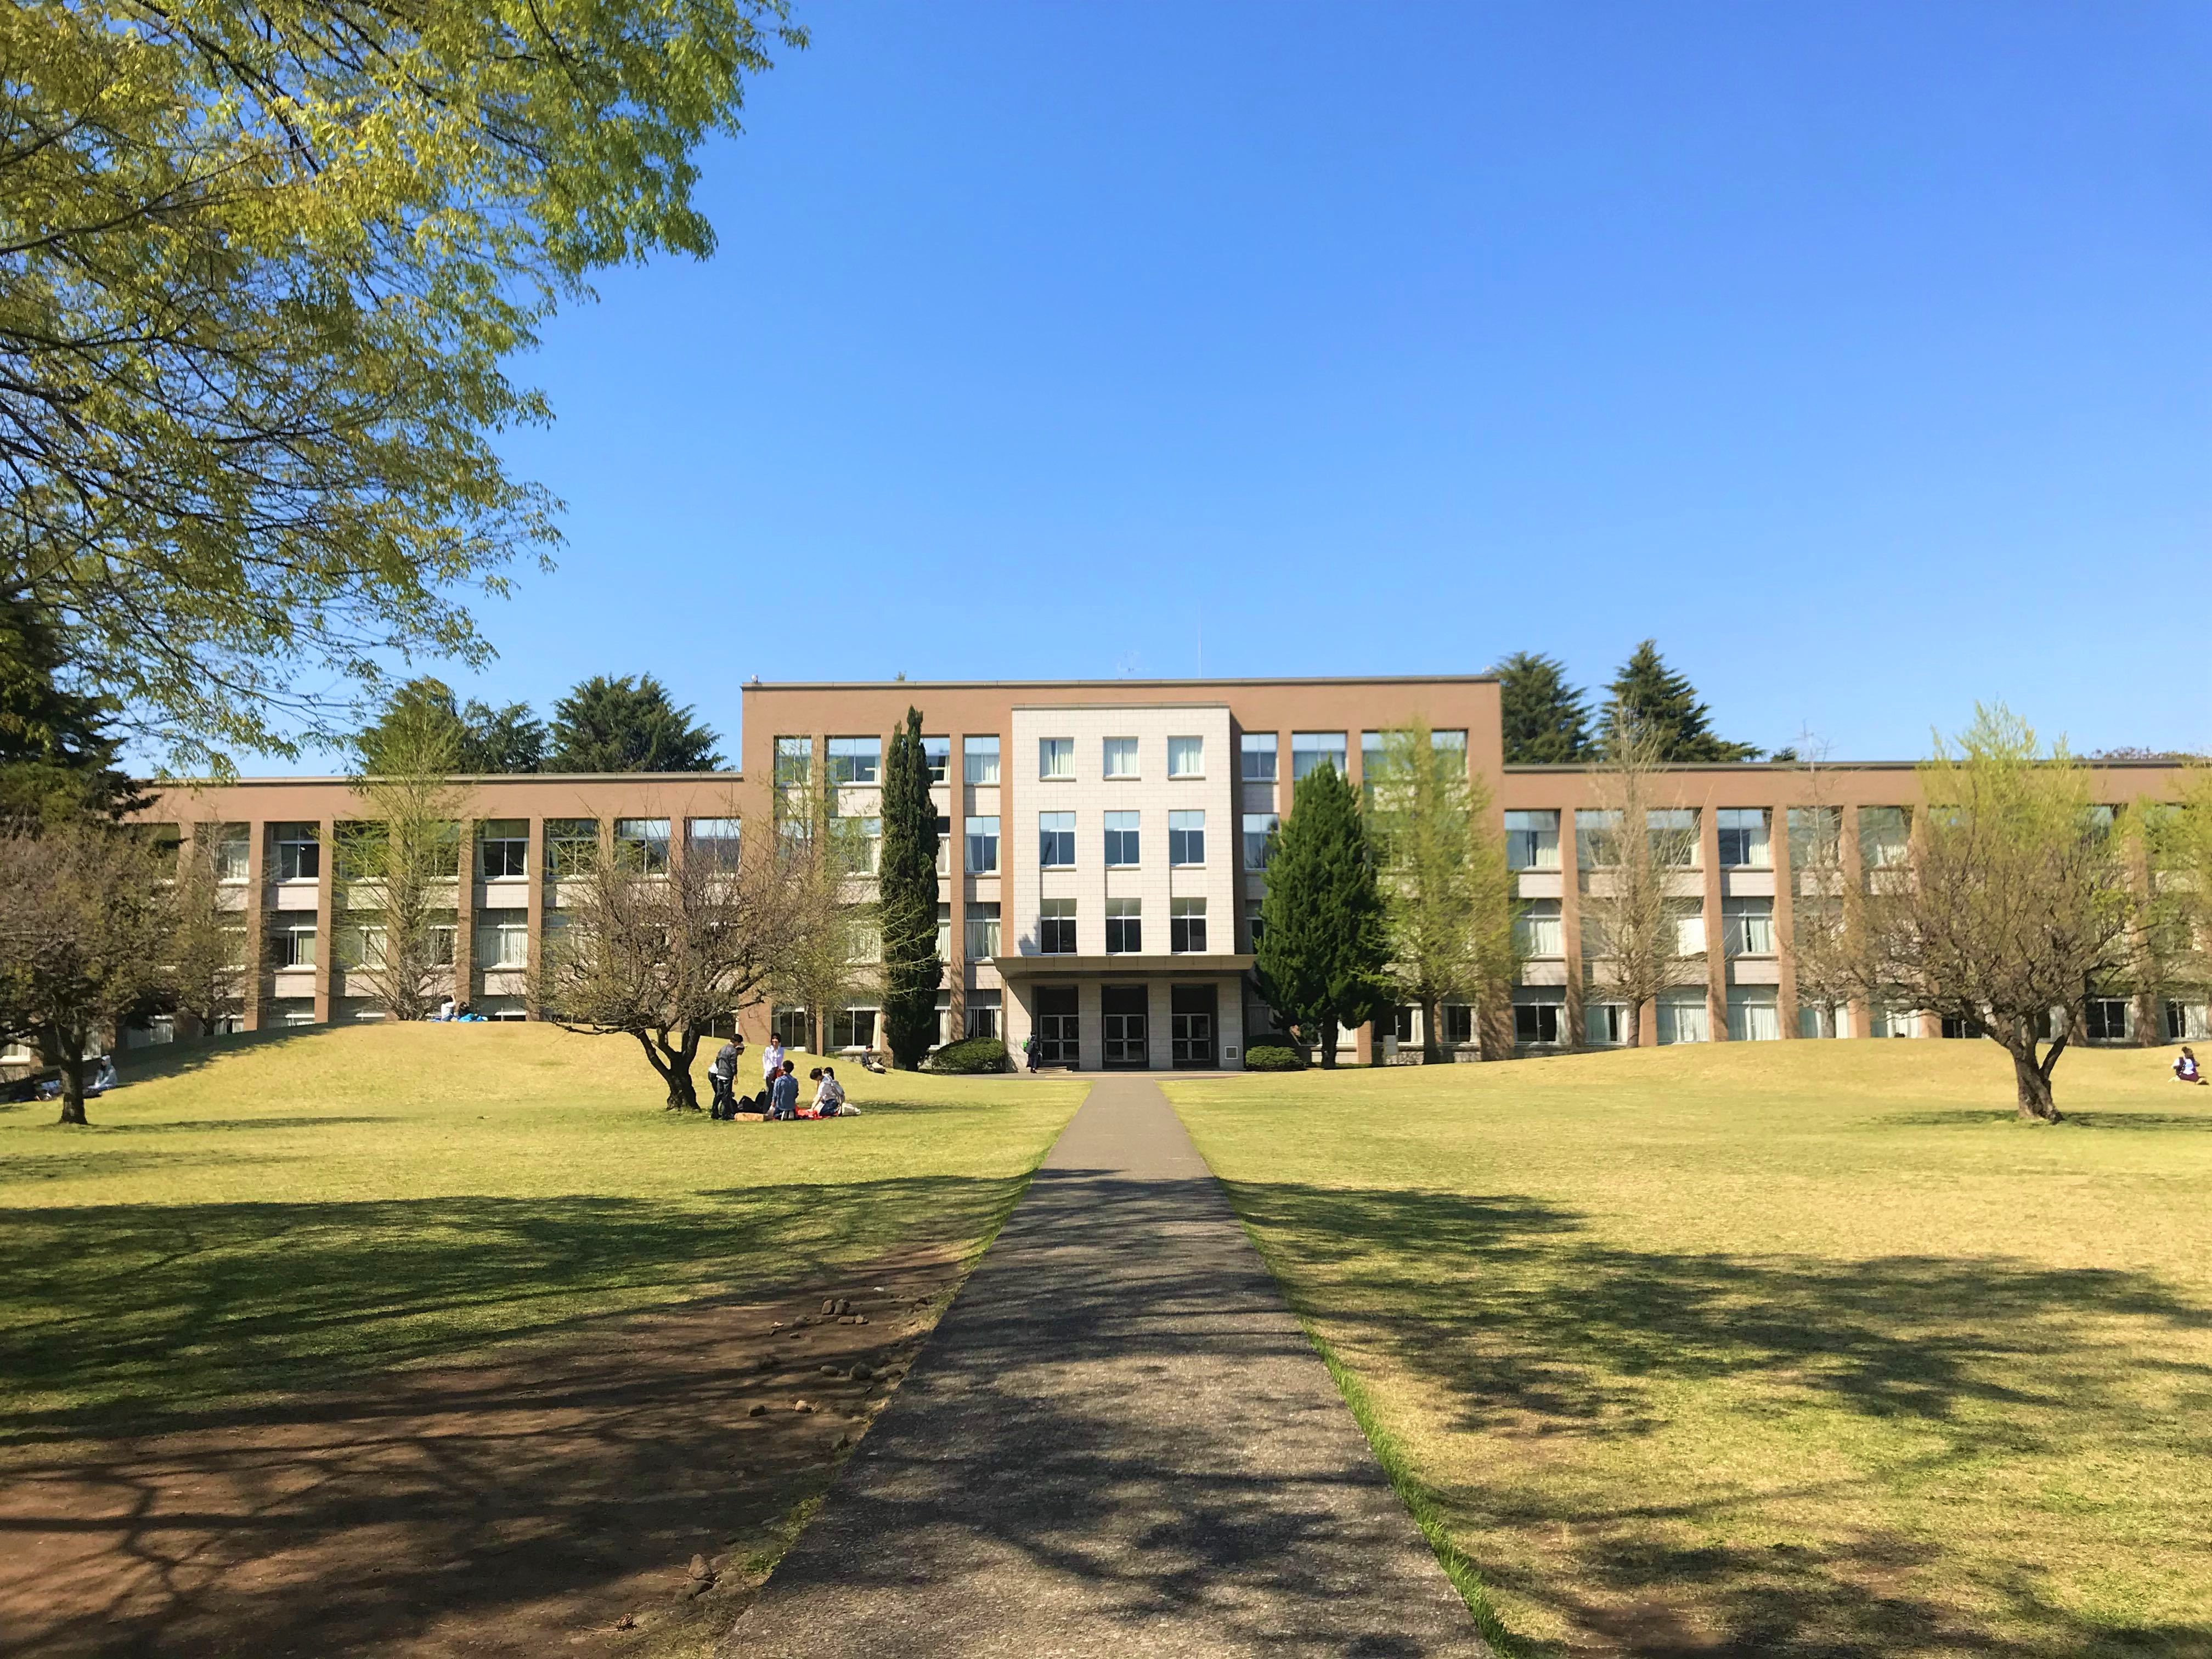 Univ-it!の国際基督教大学取材記事